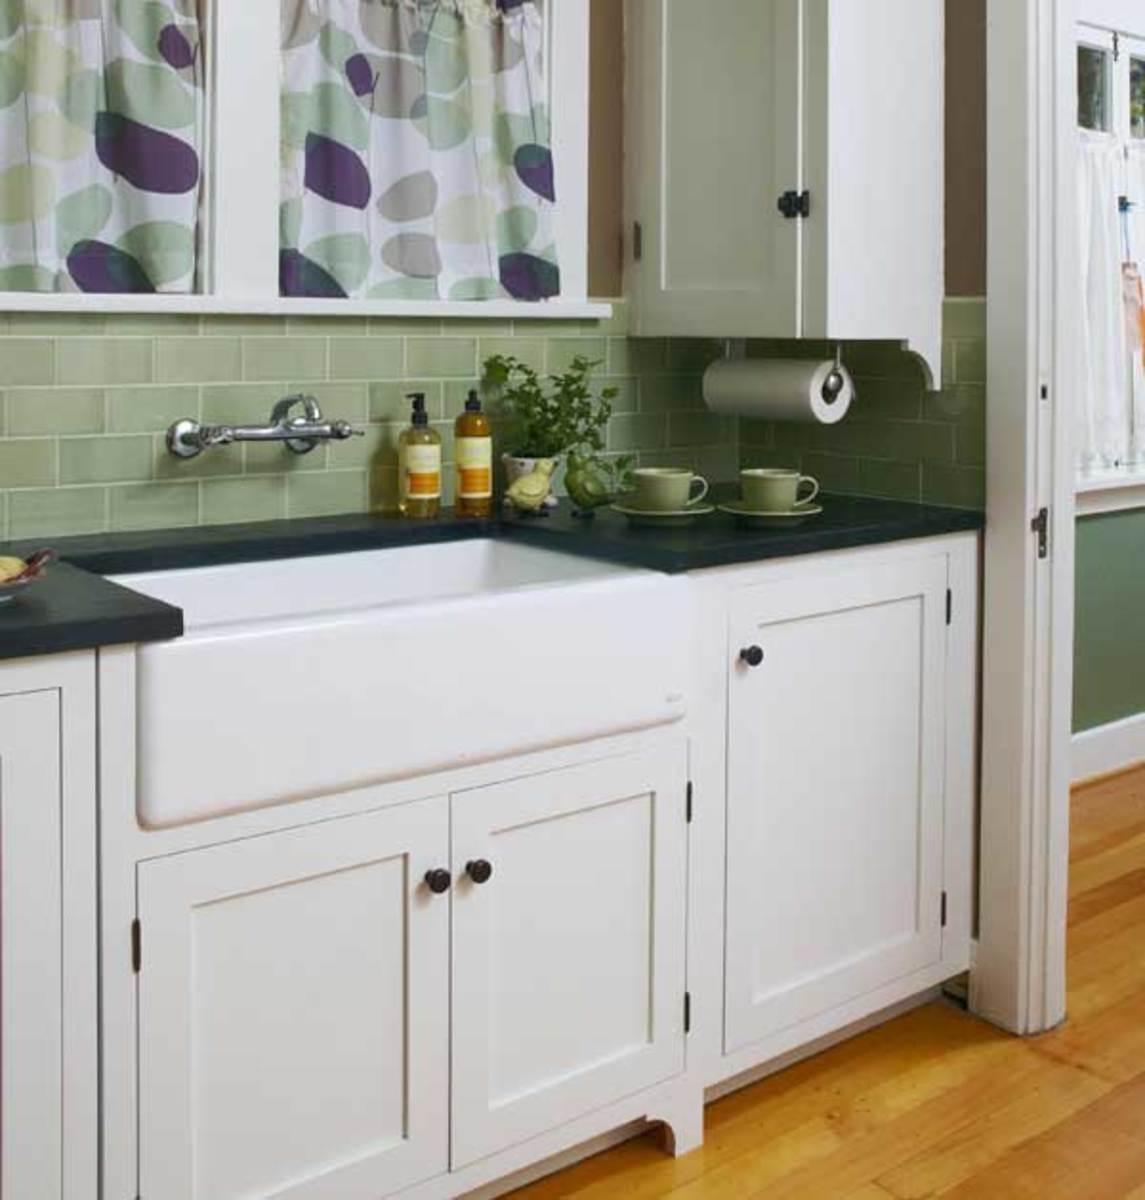 Countertop, Sink & Backsplash